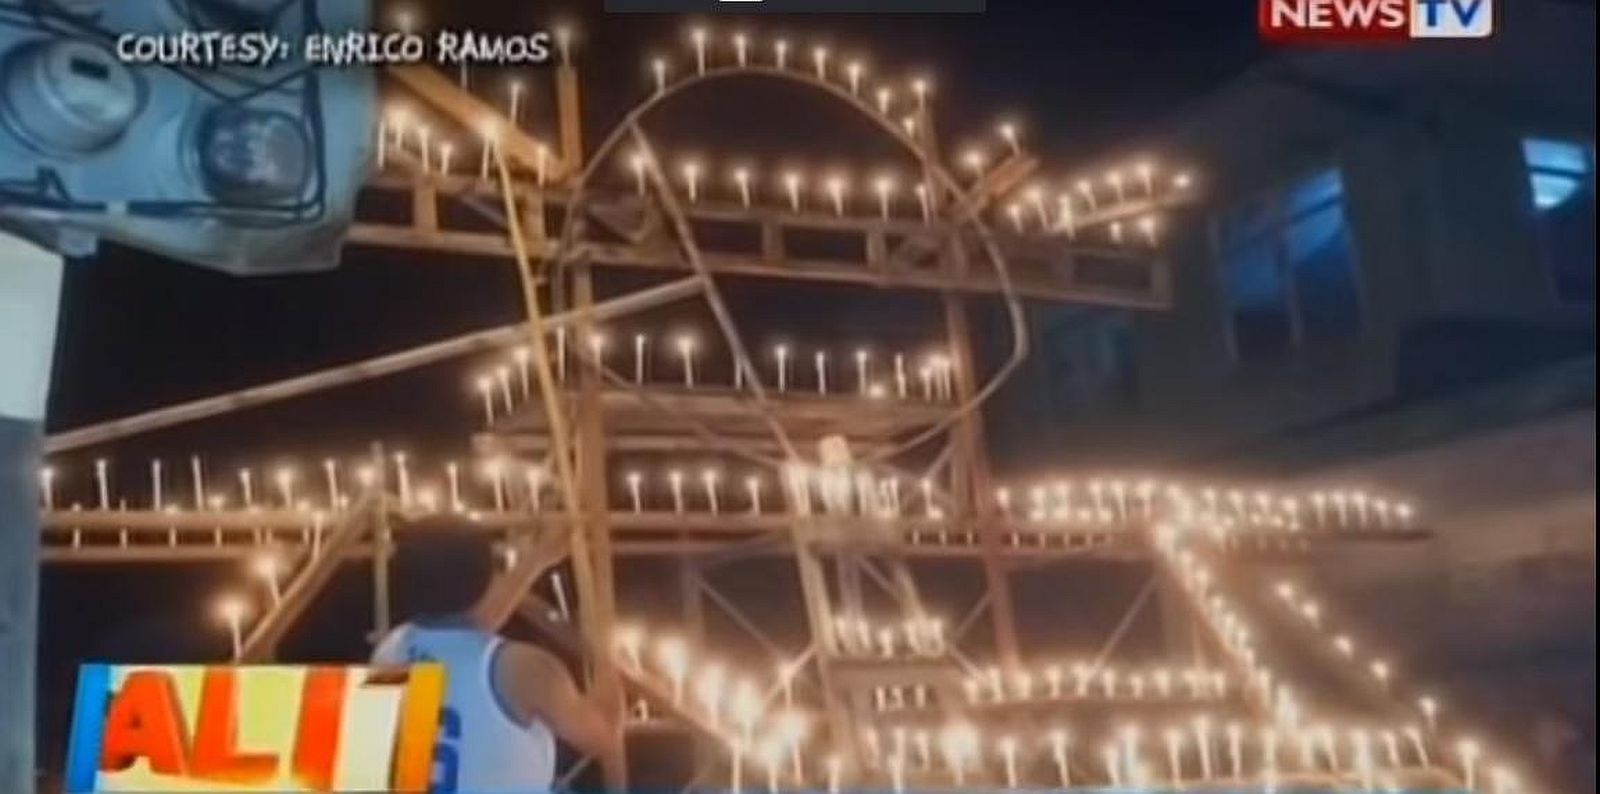 PHILIPPINEN REISEN - KULTUR- FESTE - Tumba Festival in San Luis